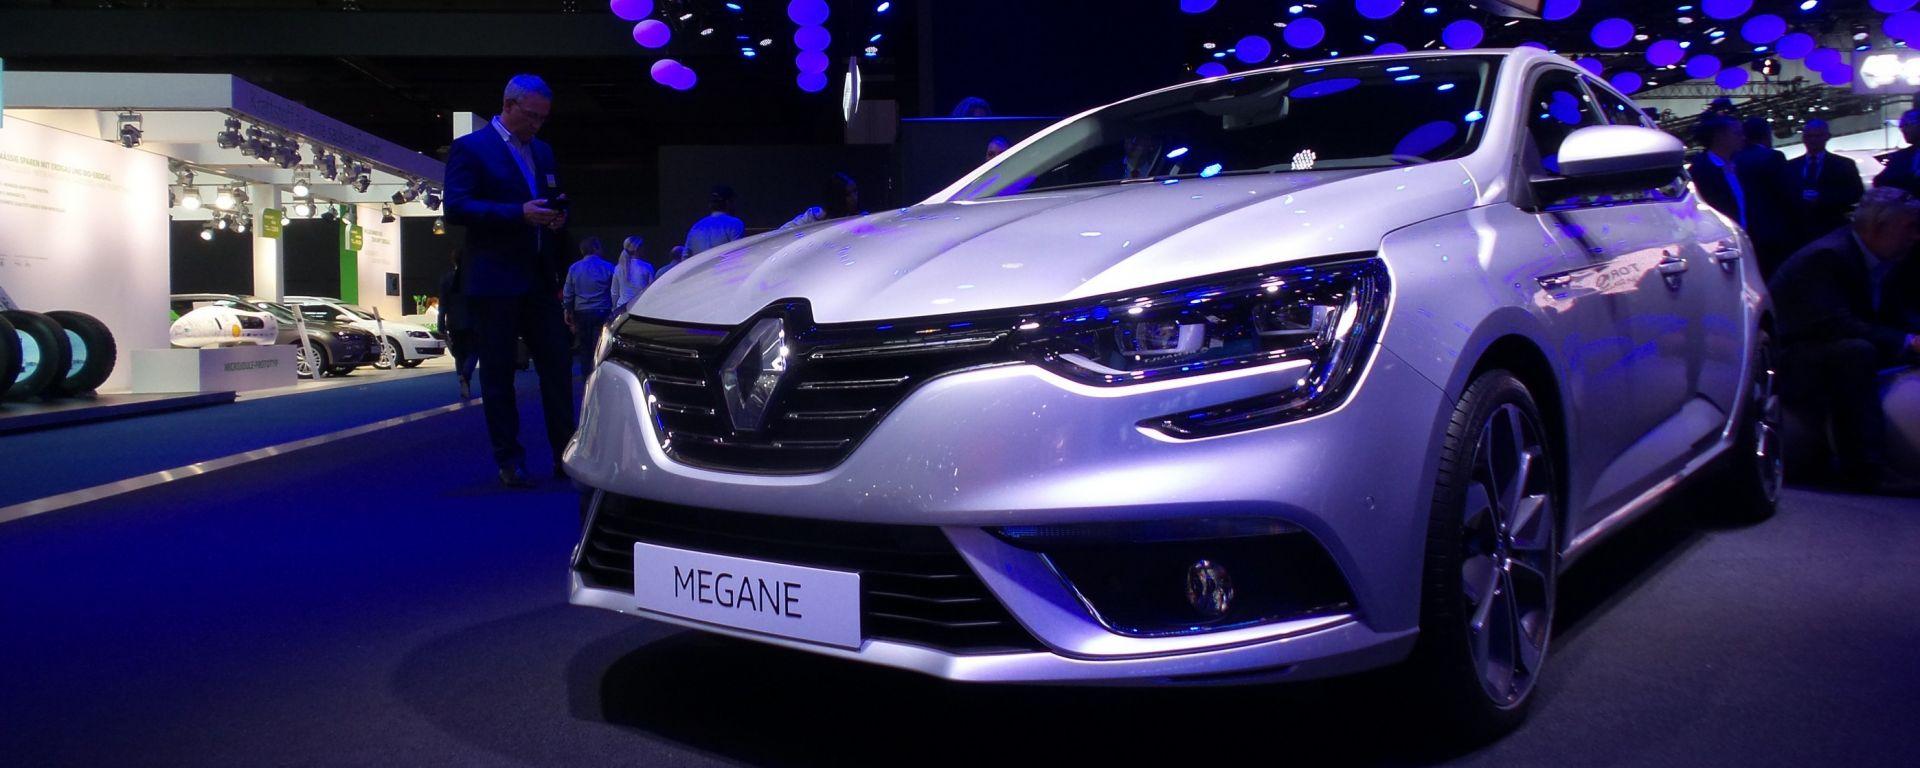 Renault Mégane 2016 al Salone di Francoforte